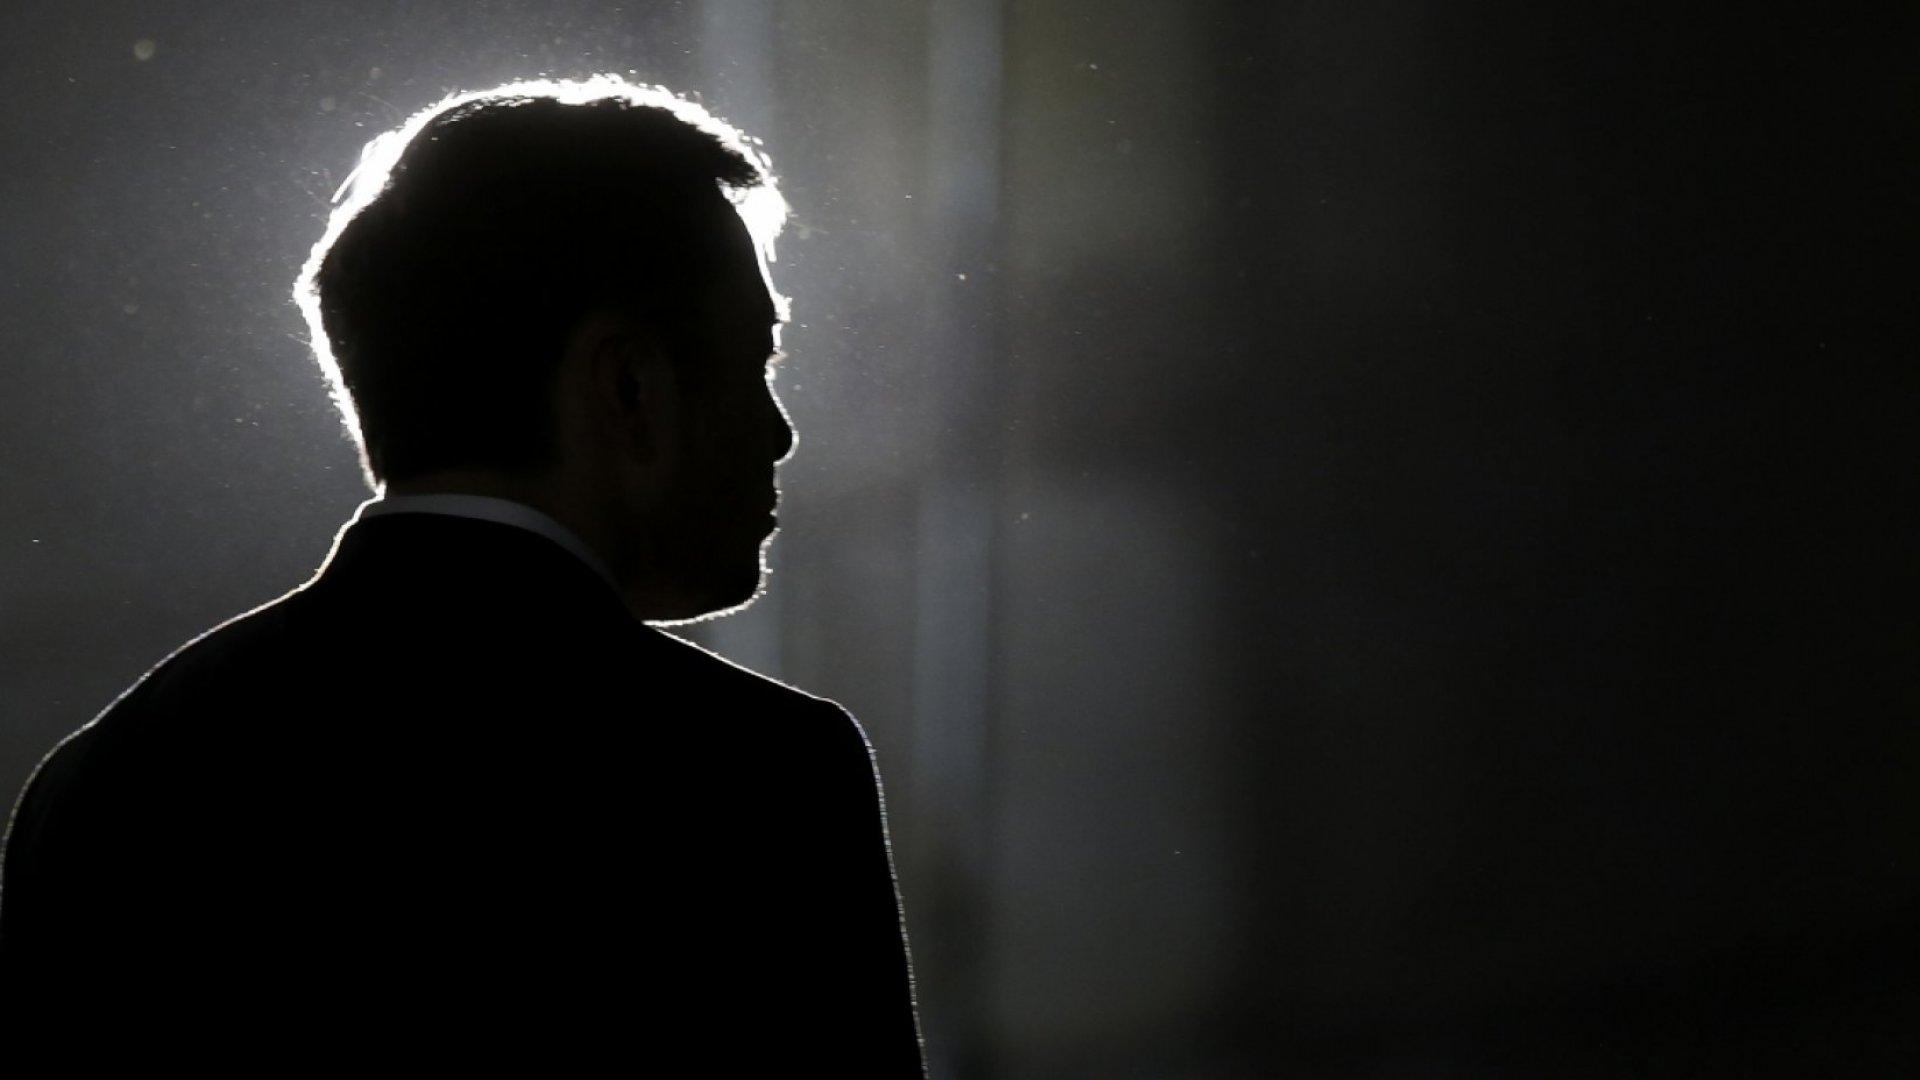 Elon Musk's Erratic Twitter Behavior Teaches 3 Brutal Leadership Lessons--and What Not to Do